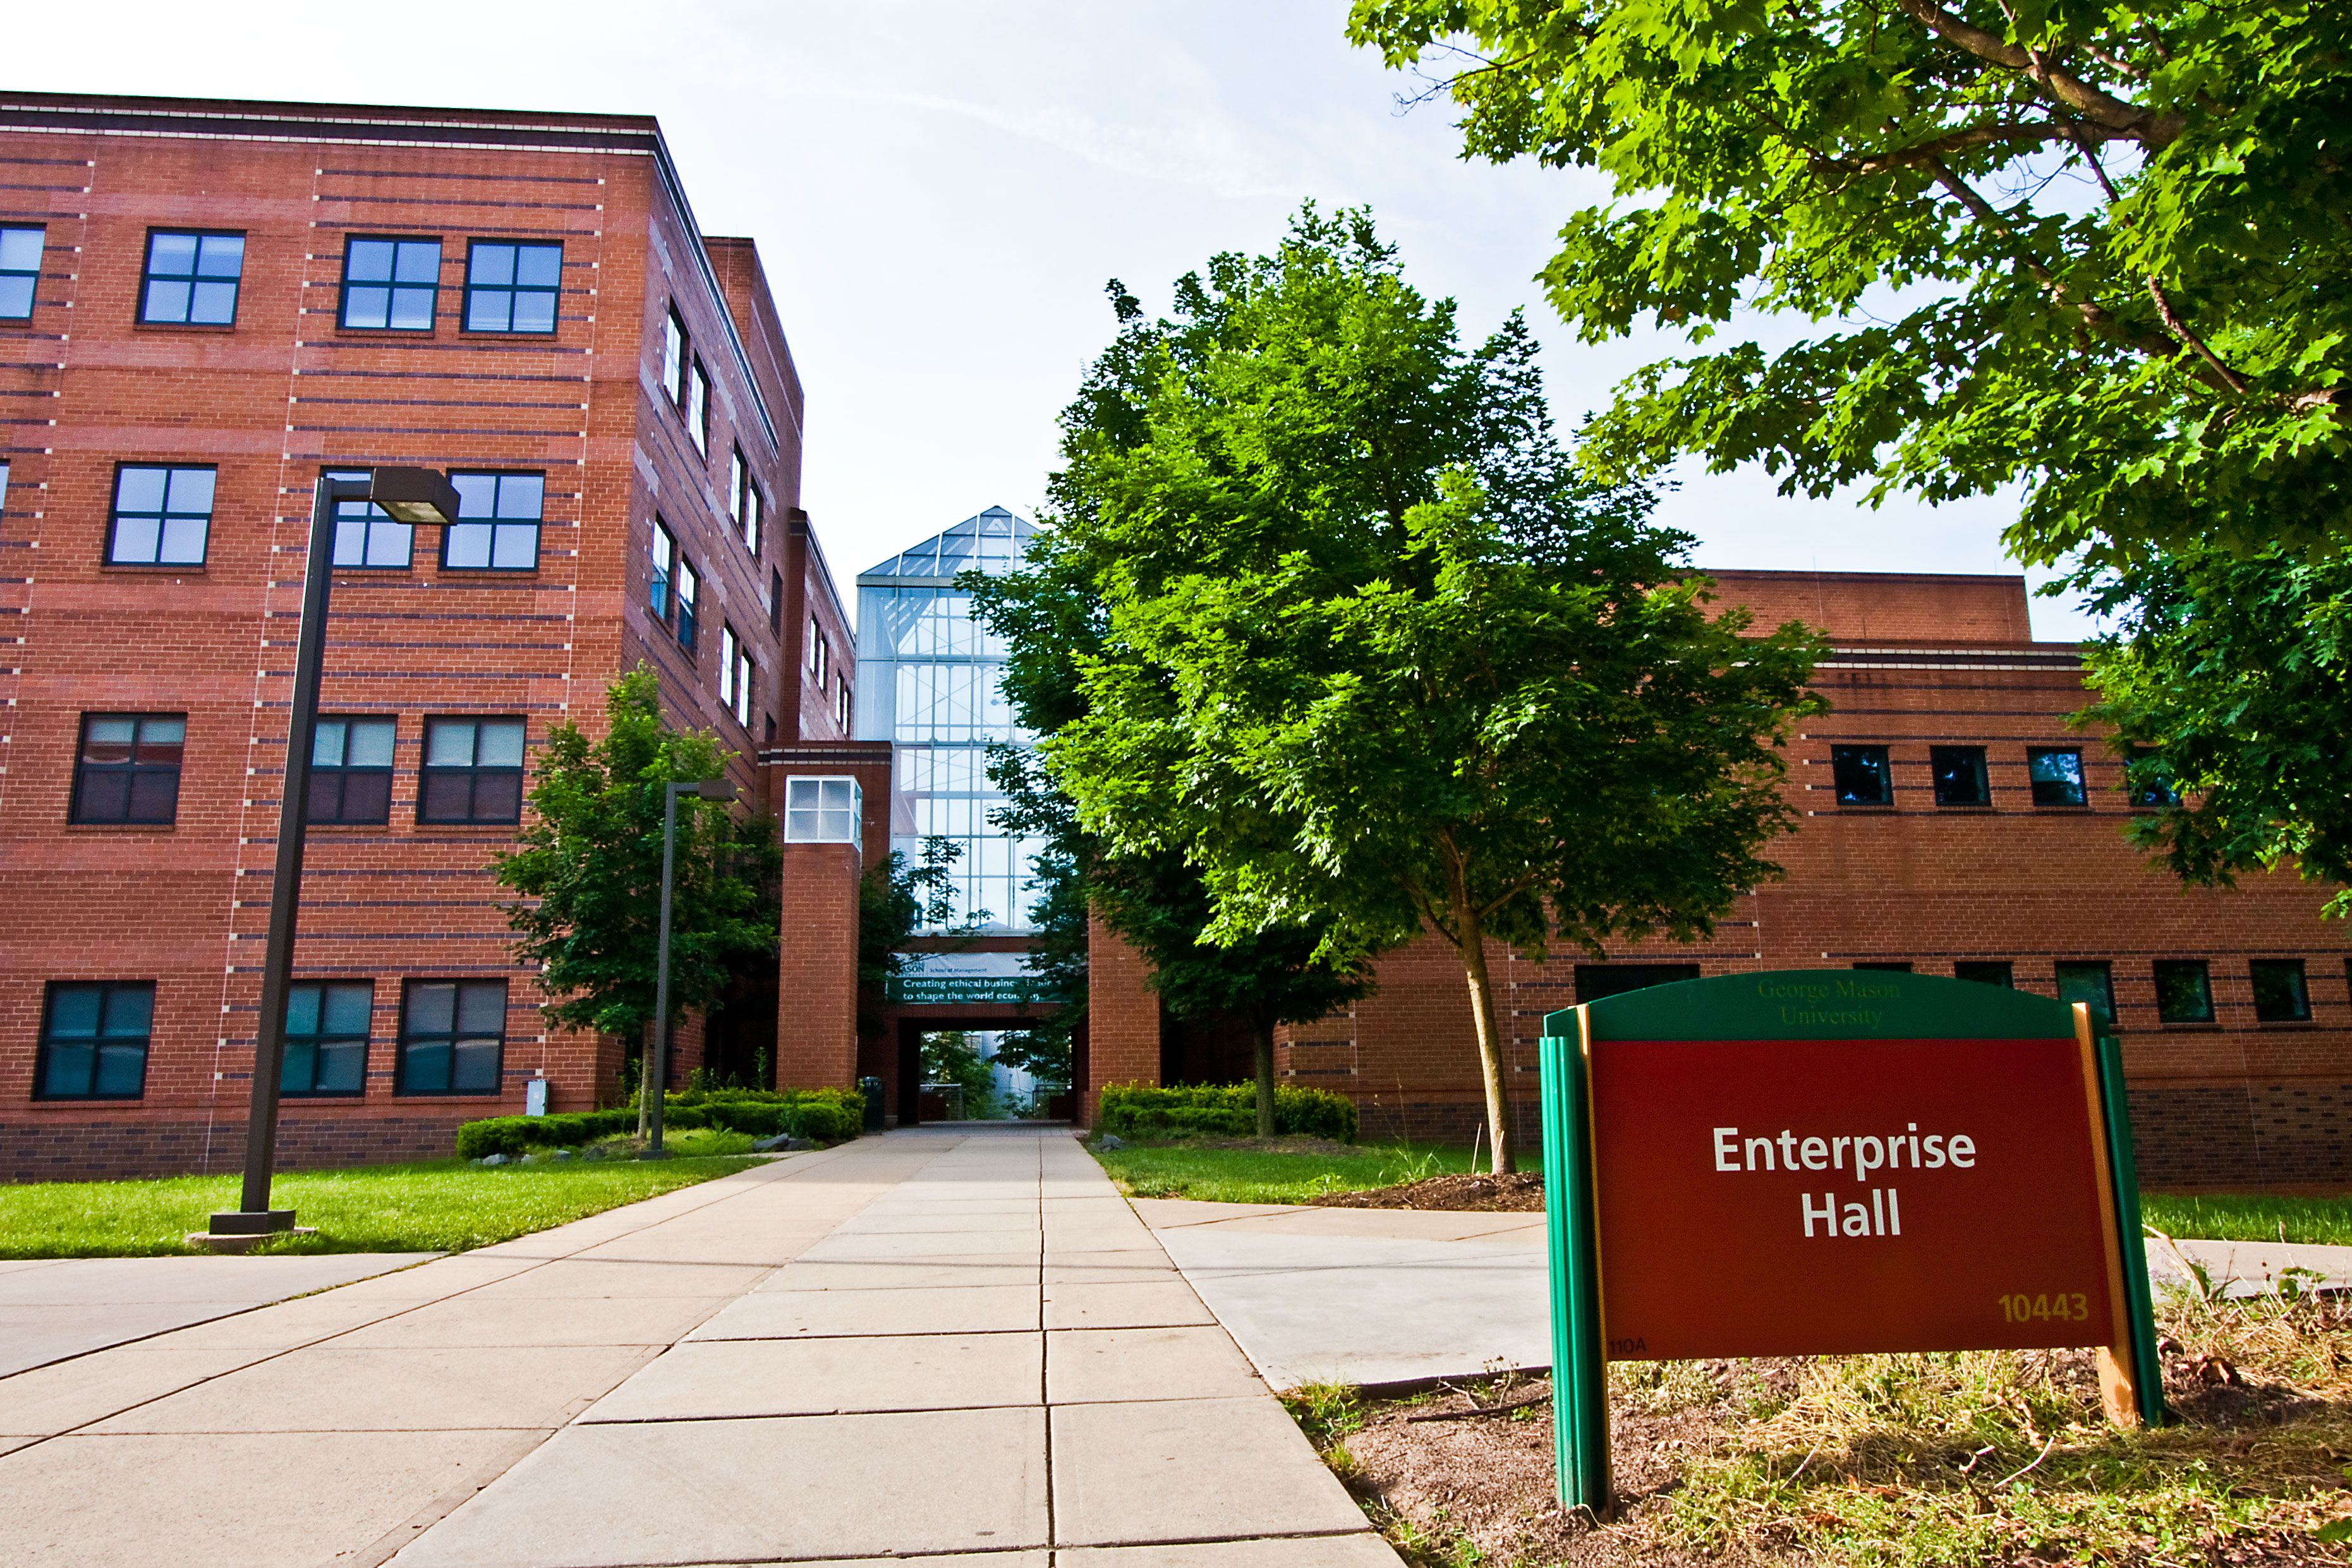 Mason S Bachelor S Program In Accounting Ranked In The Top 50 Nationally Bachelor S Accounting Outdoor